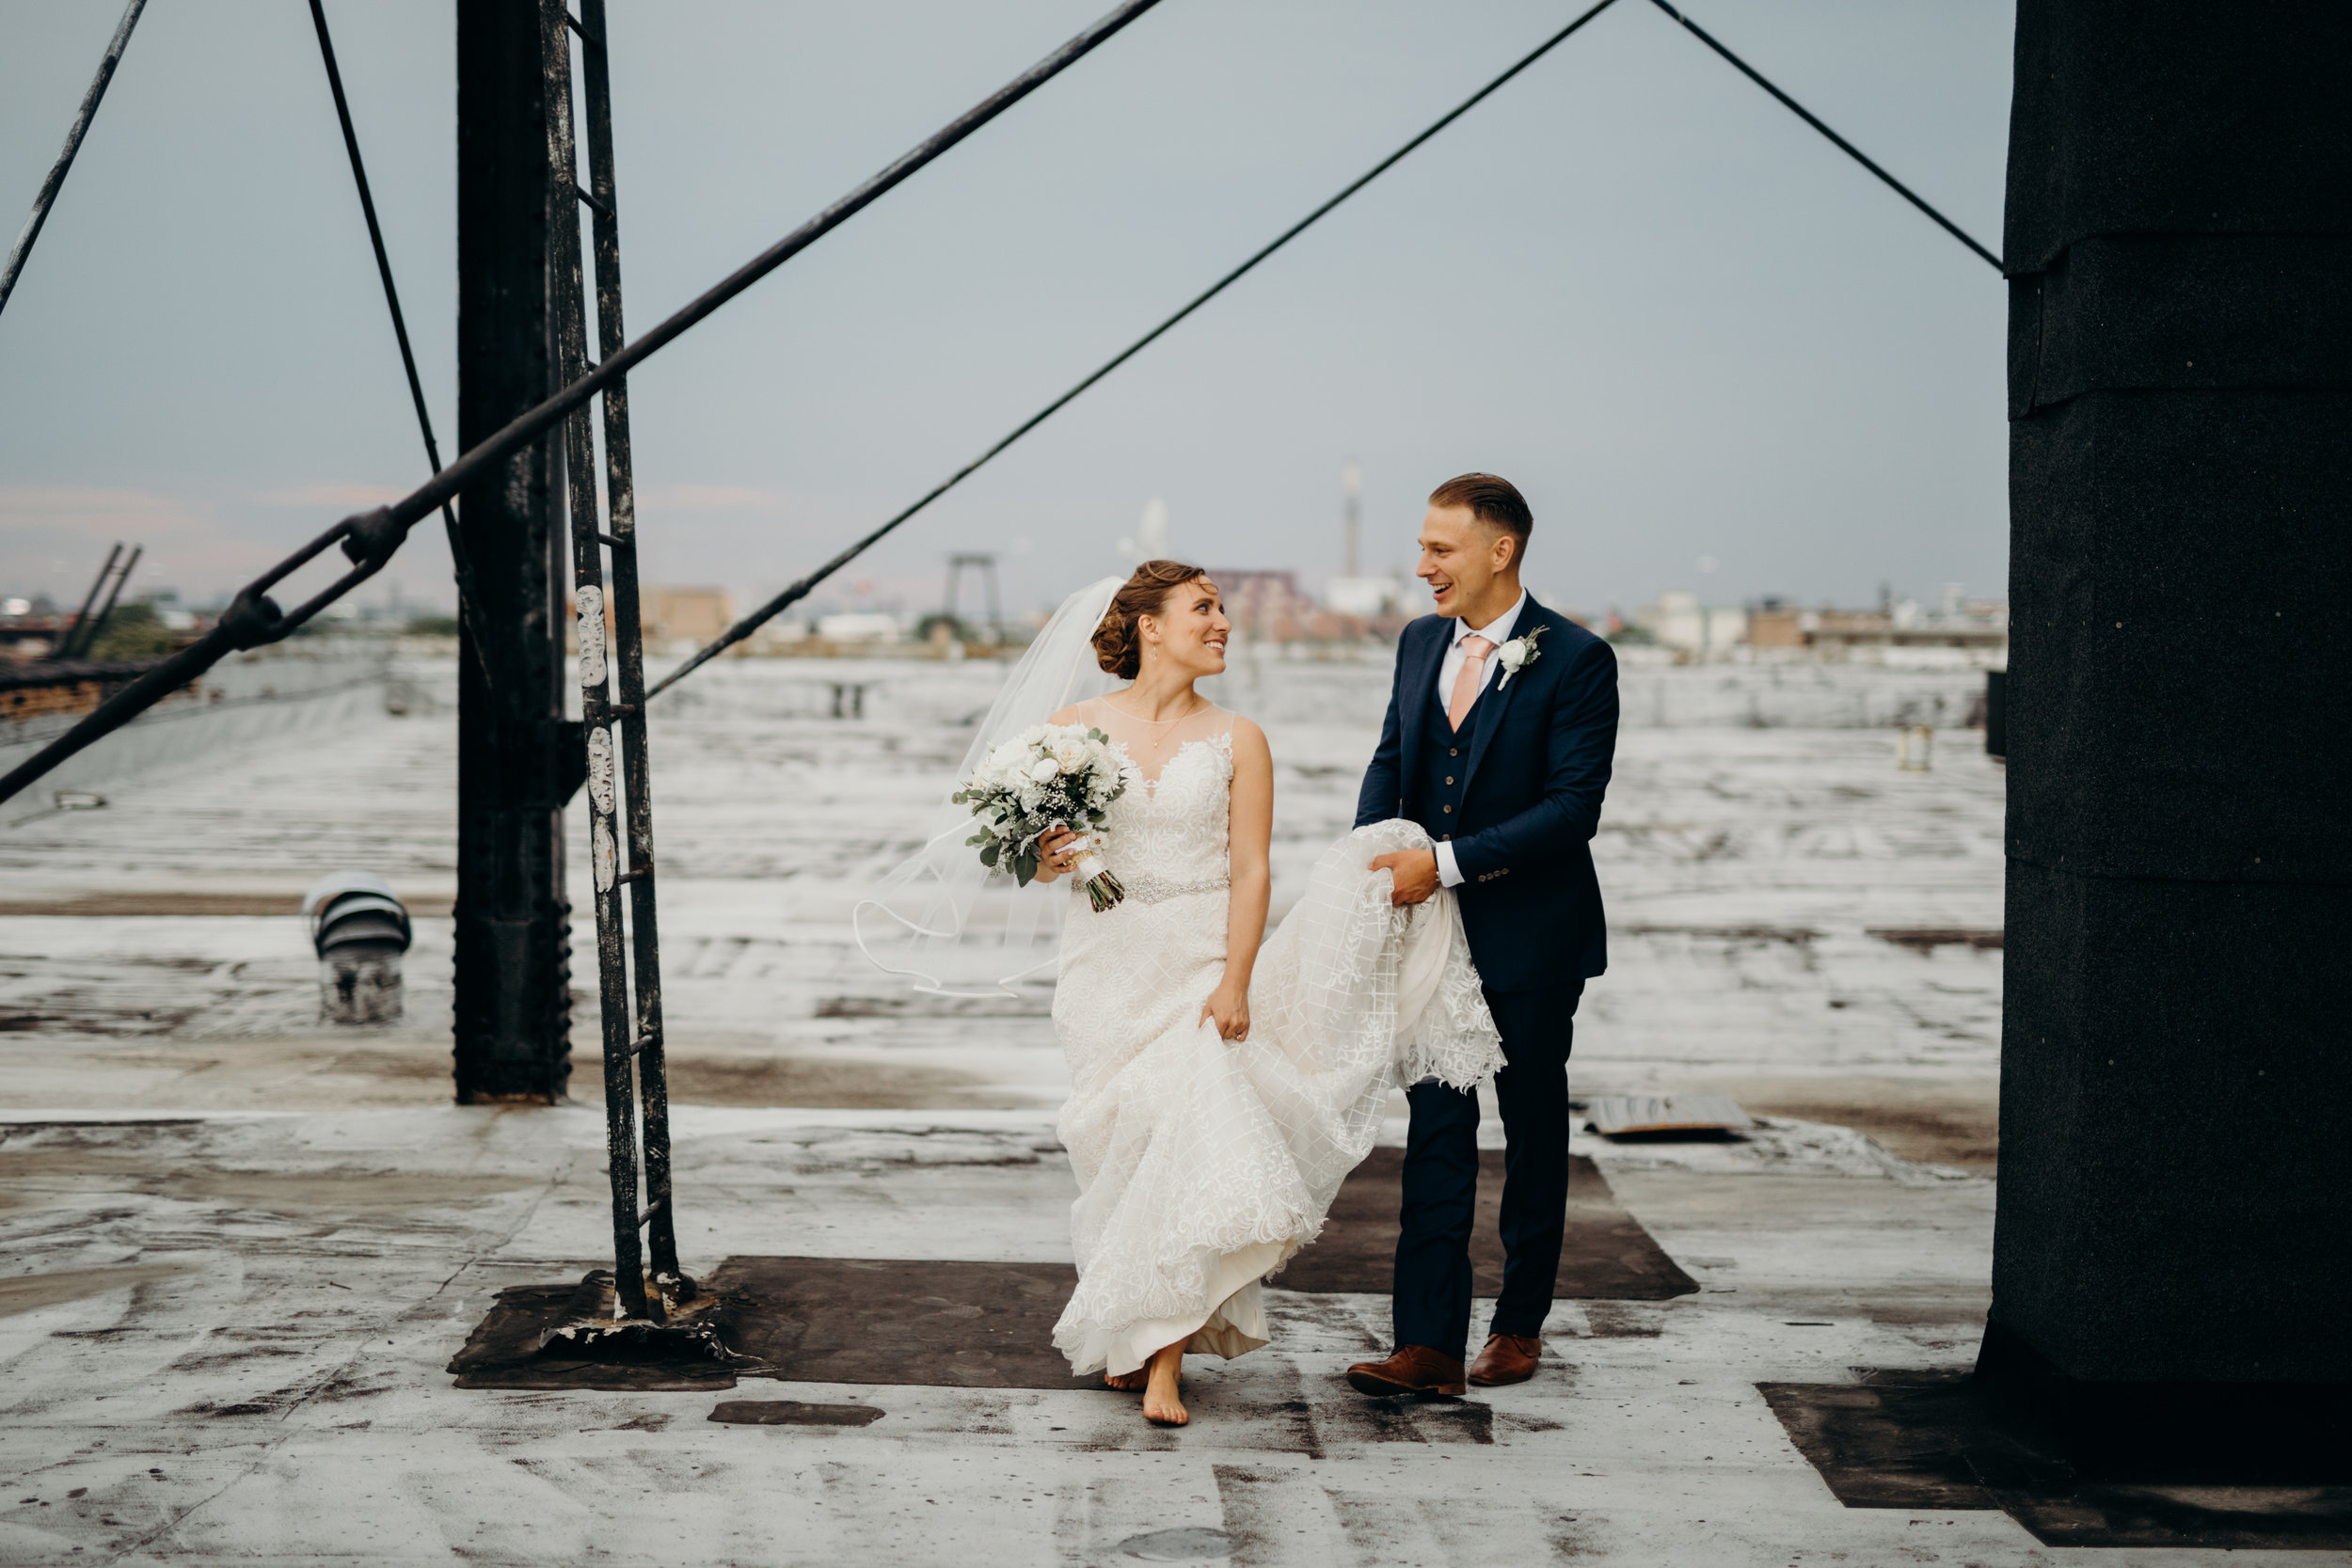 Vintage Wedding_Polly C Photography_20171726183750.jpg